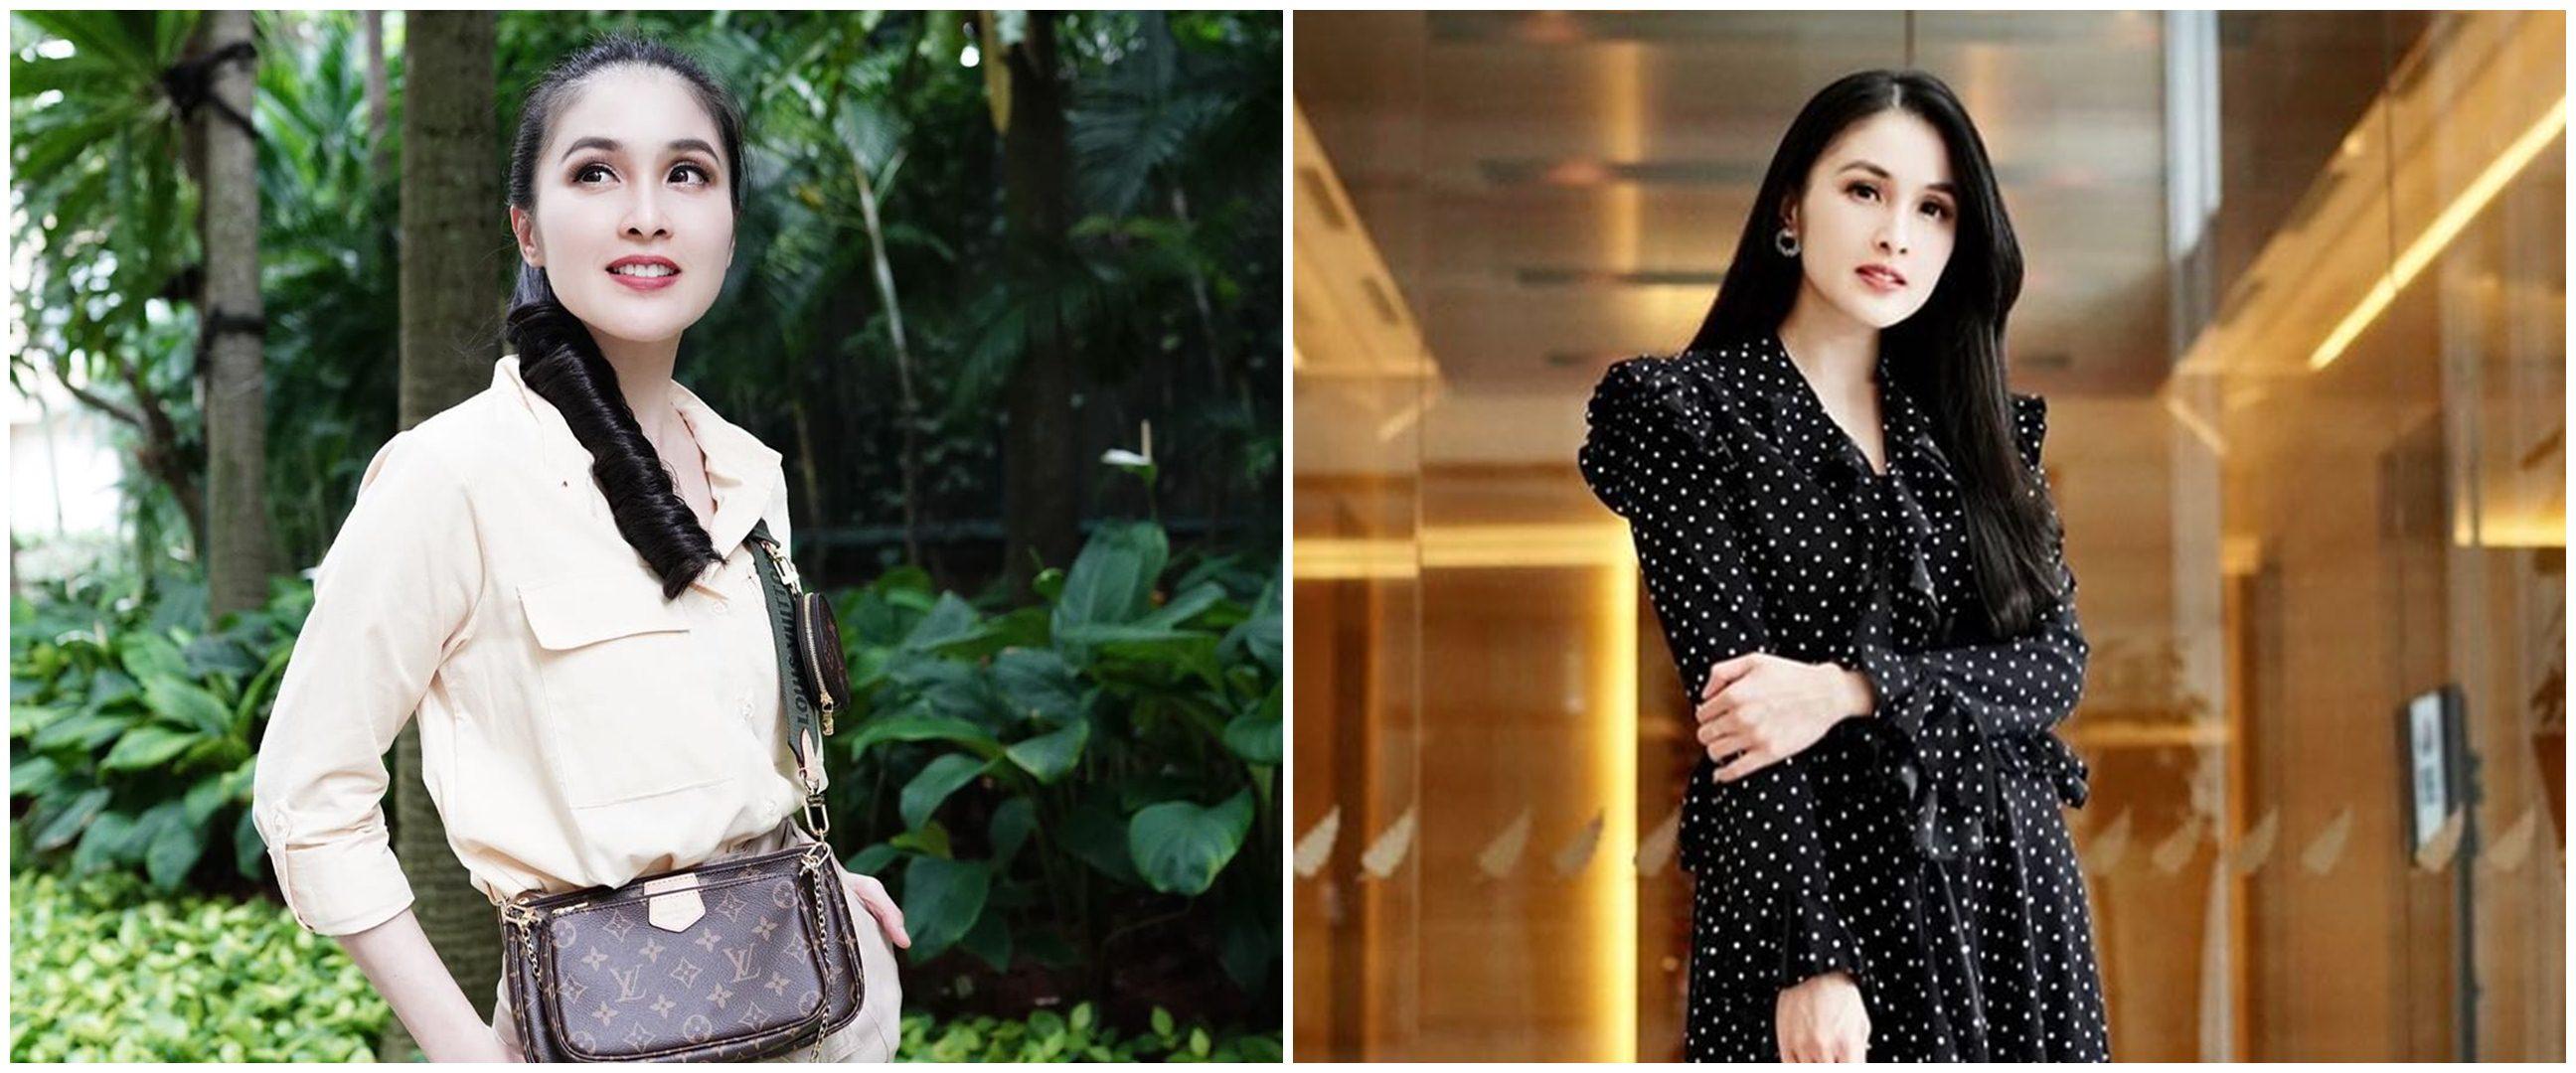 Asisten Sandra Dewi kena tipu oknum ojek online, rugi ratusan juta